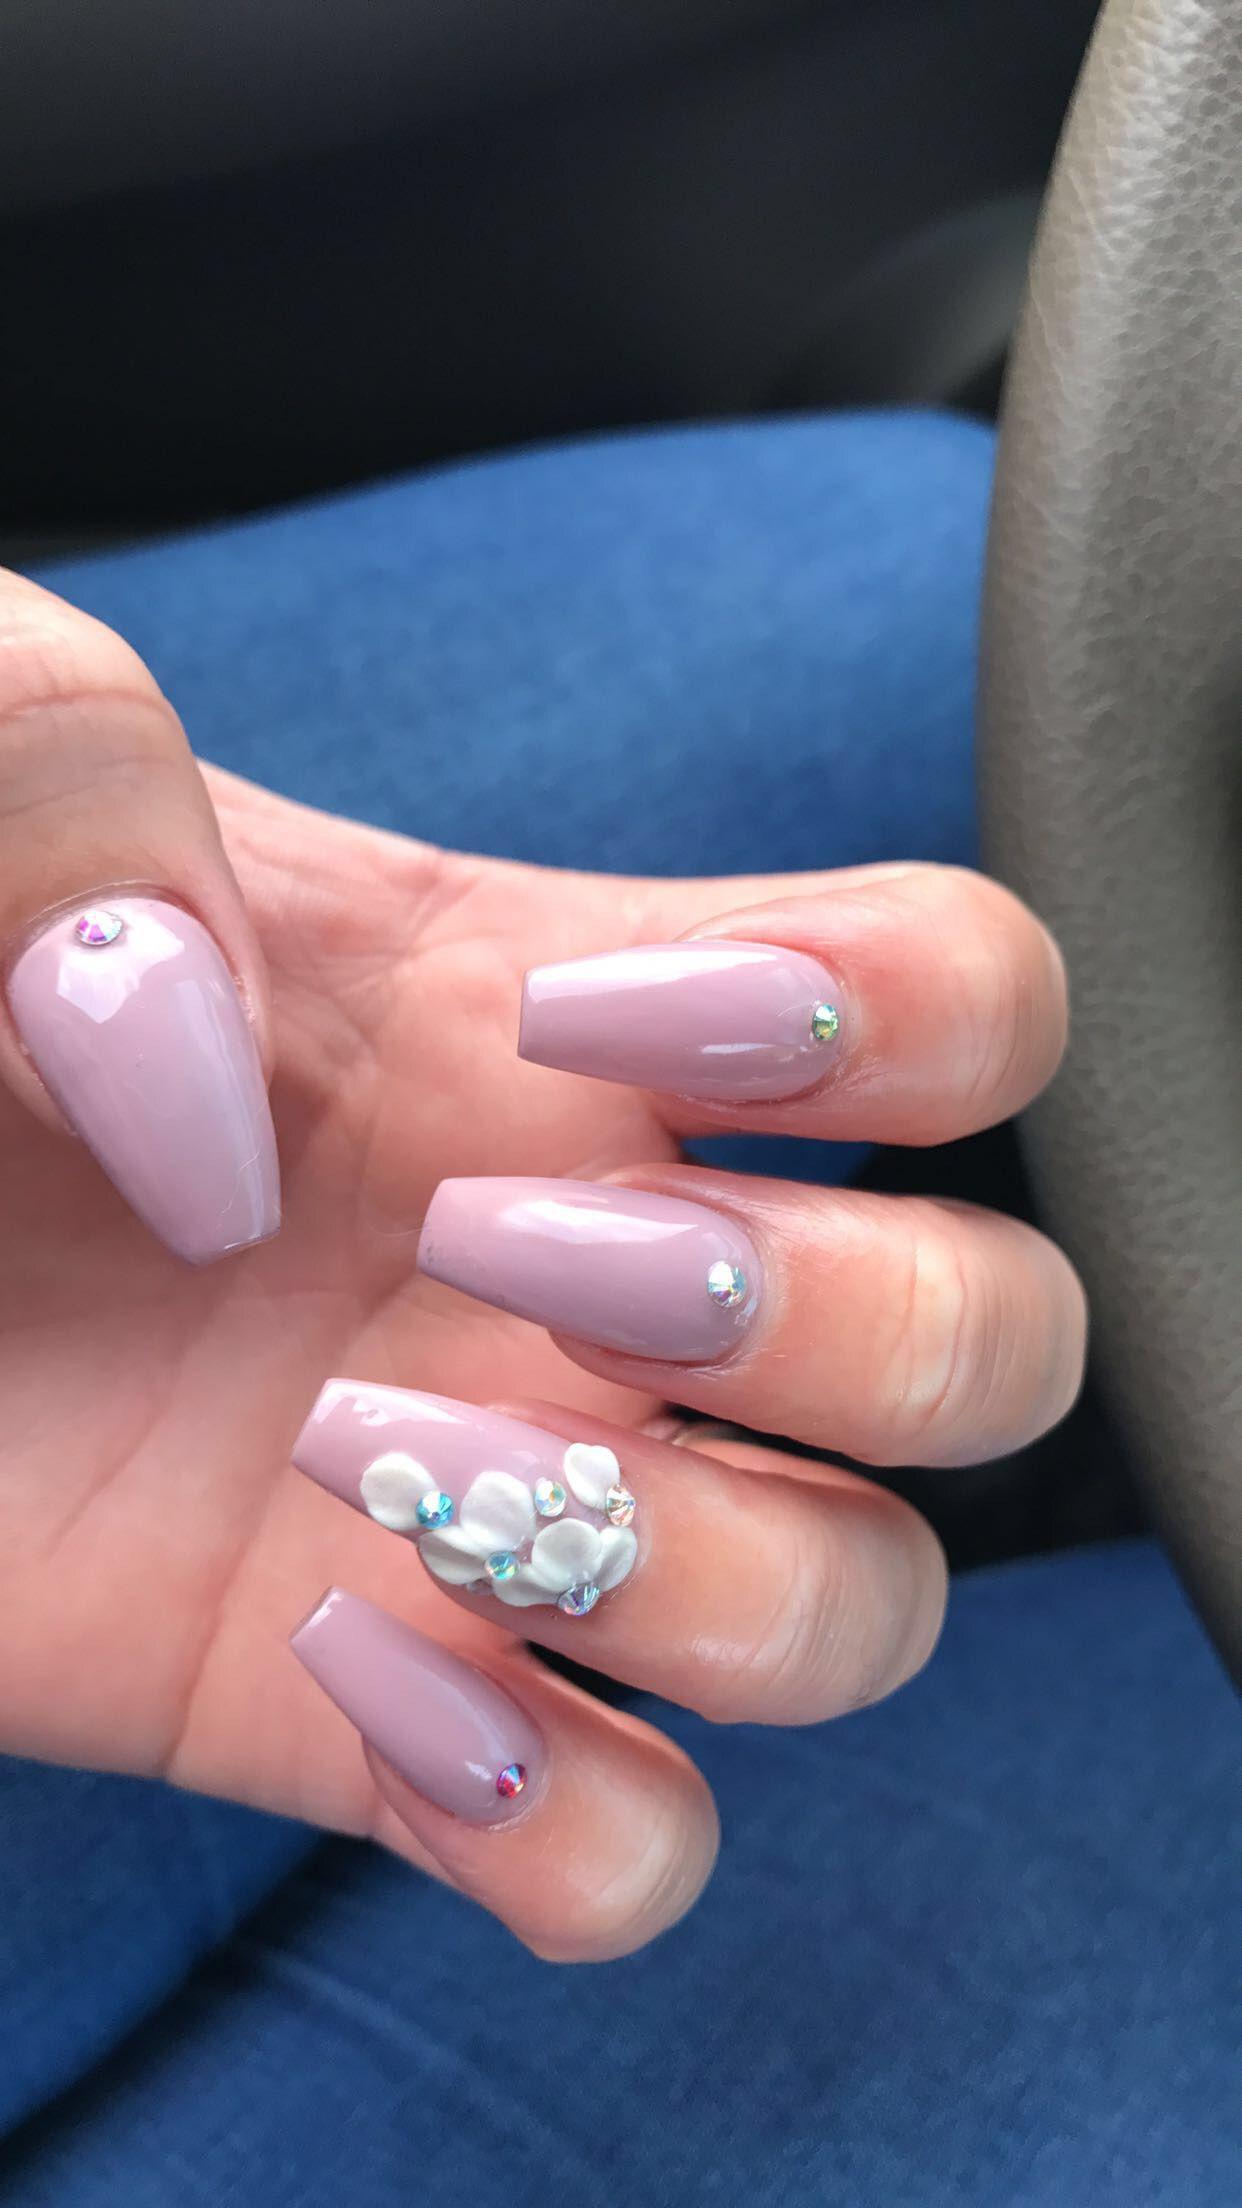 Cute Acrylic Nails With Rhinestones   www.pixshark.com ...